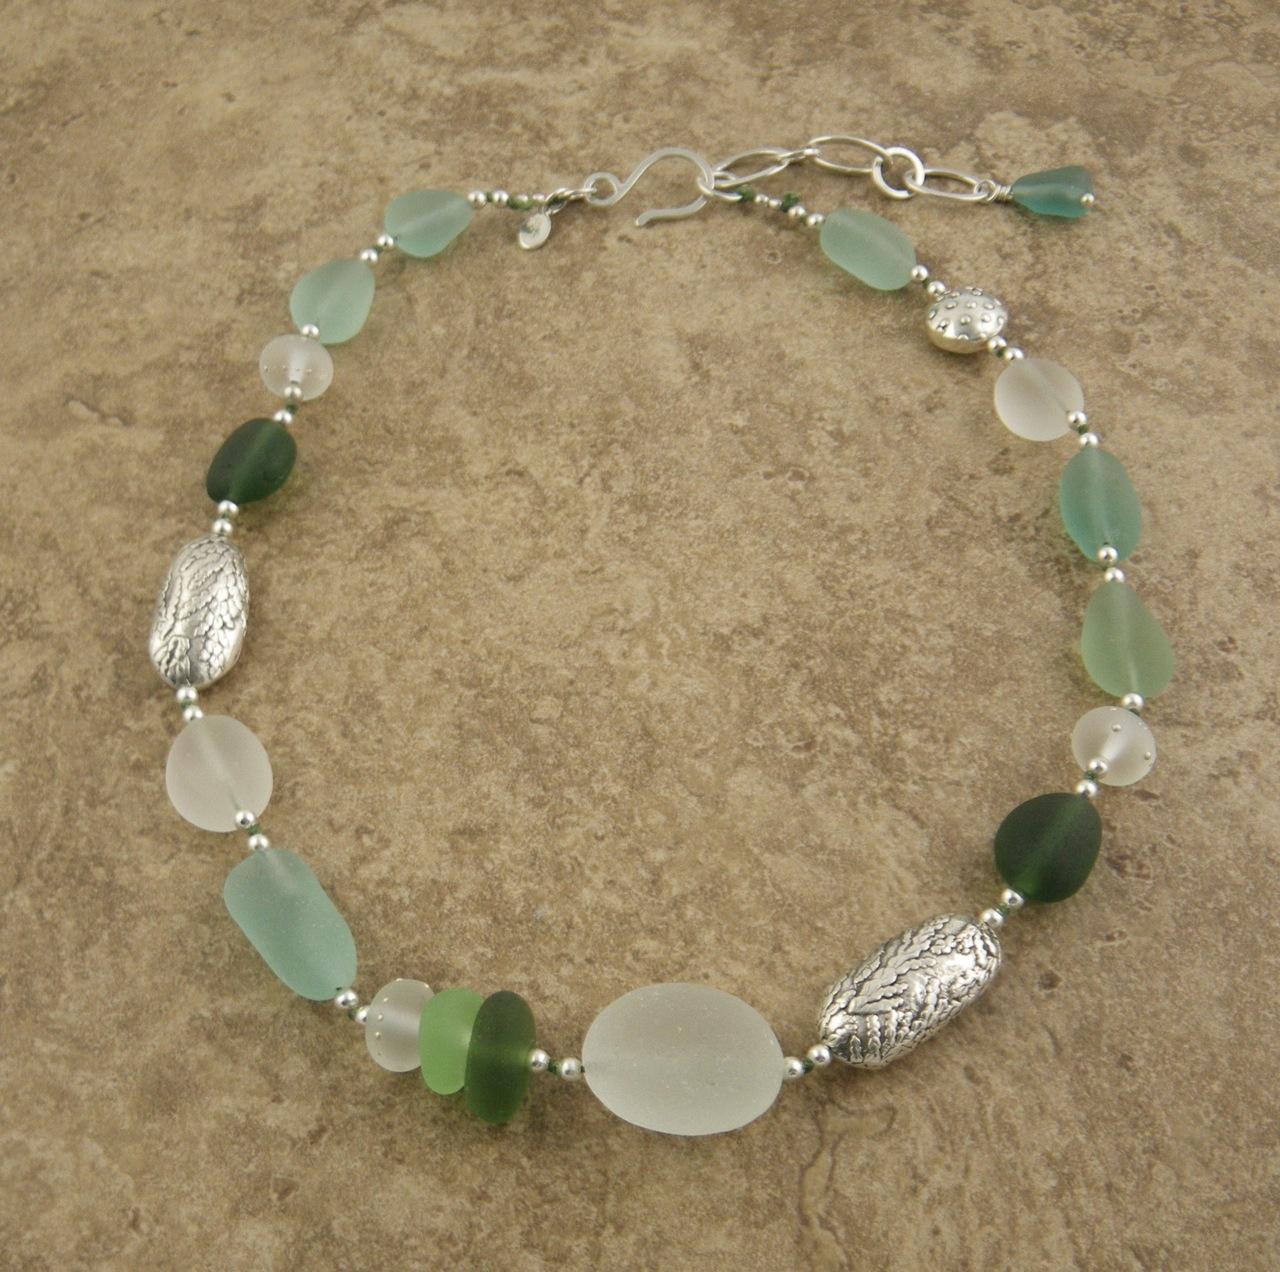 Sea glass necklace barbara s fernald jewelry cedar solutioingenieria Images